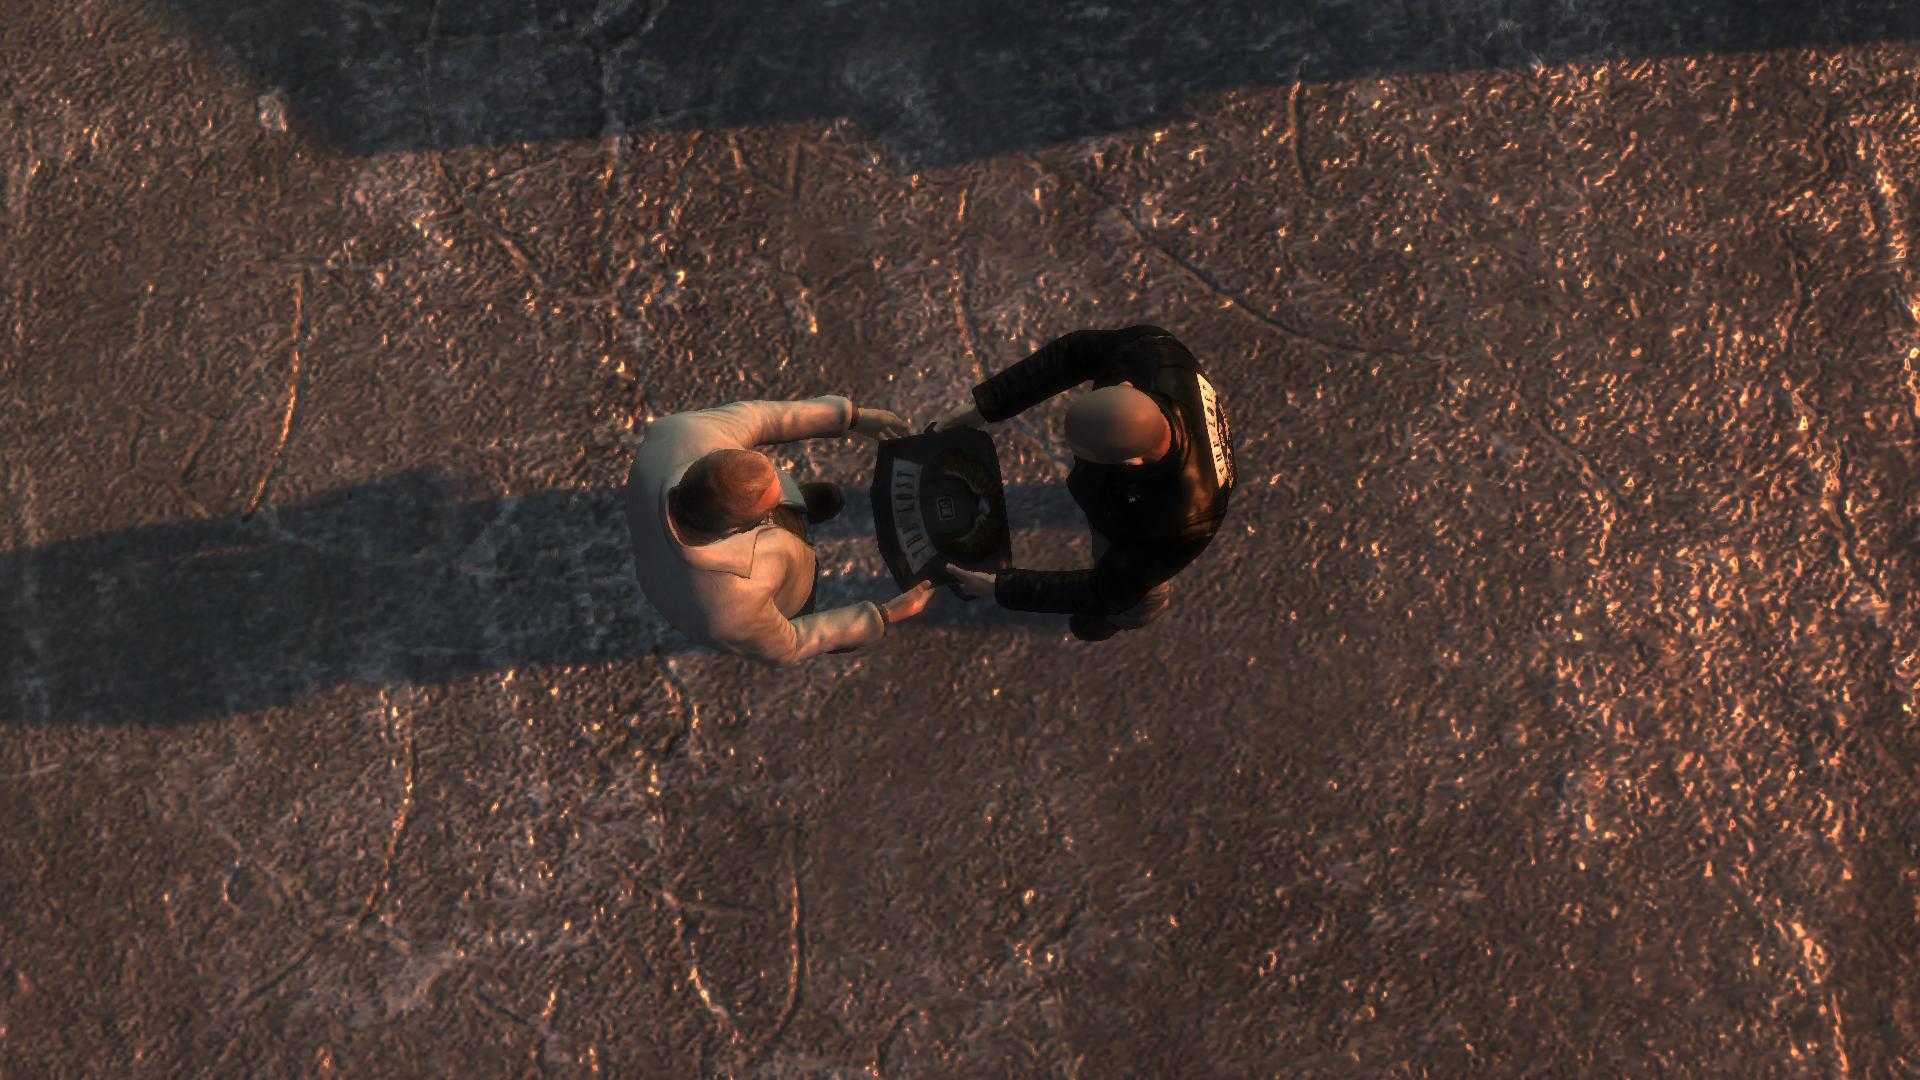 Grand-Theft-Auto-4-Screenshot-2020-06-13